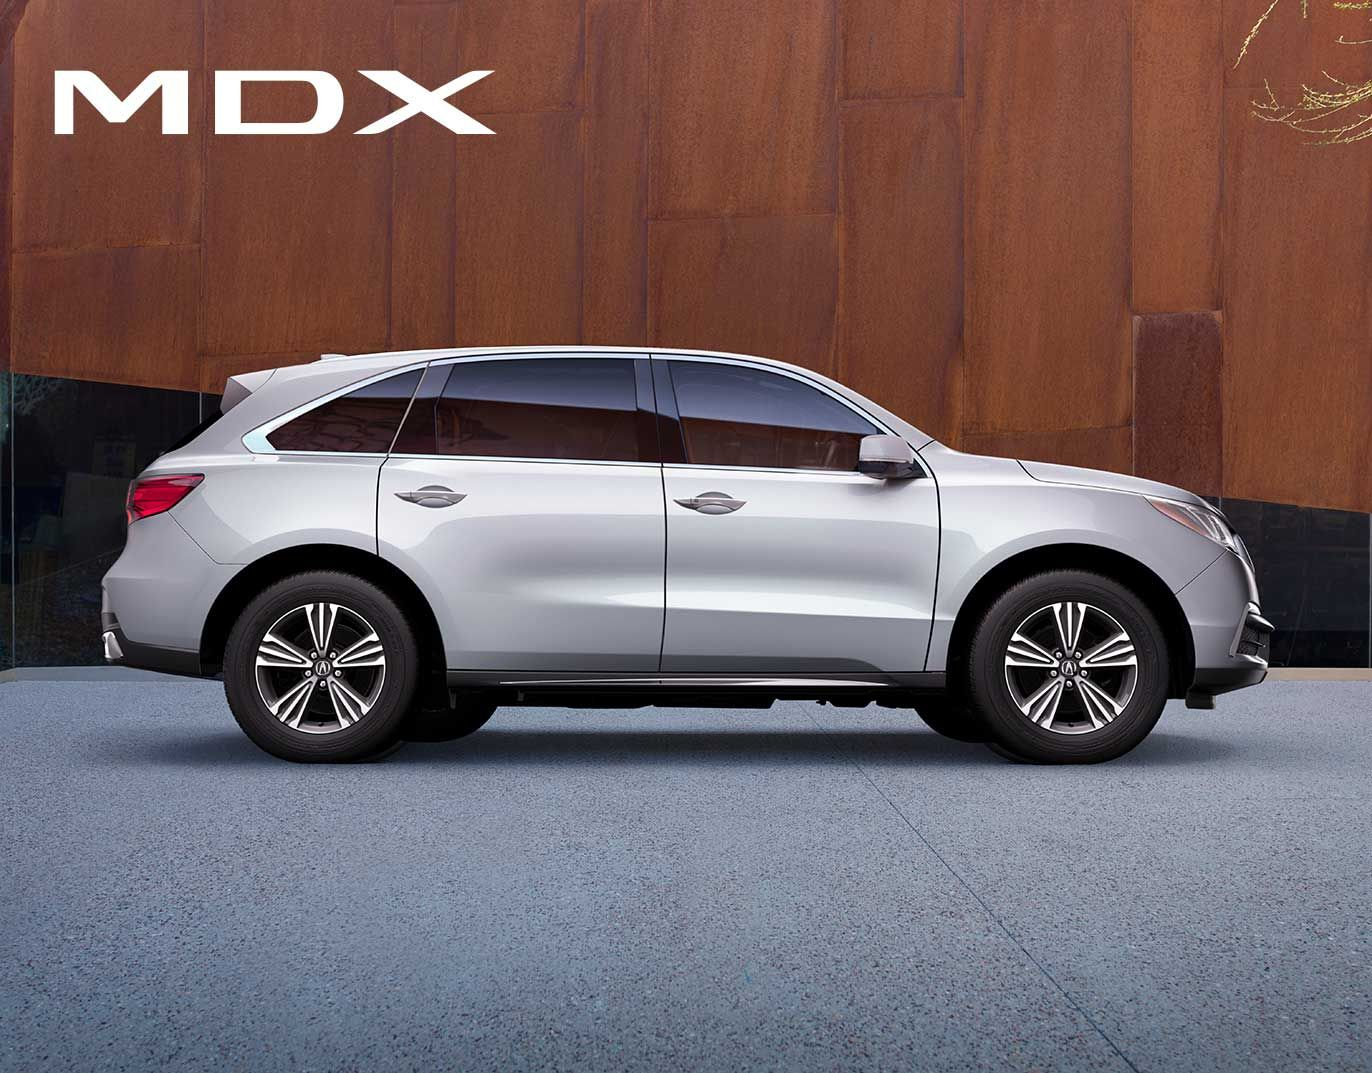 2018 Acura MDX & Sport Hybrid 3rd Row Luxury SUV Acura